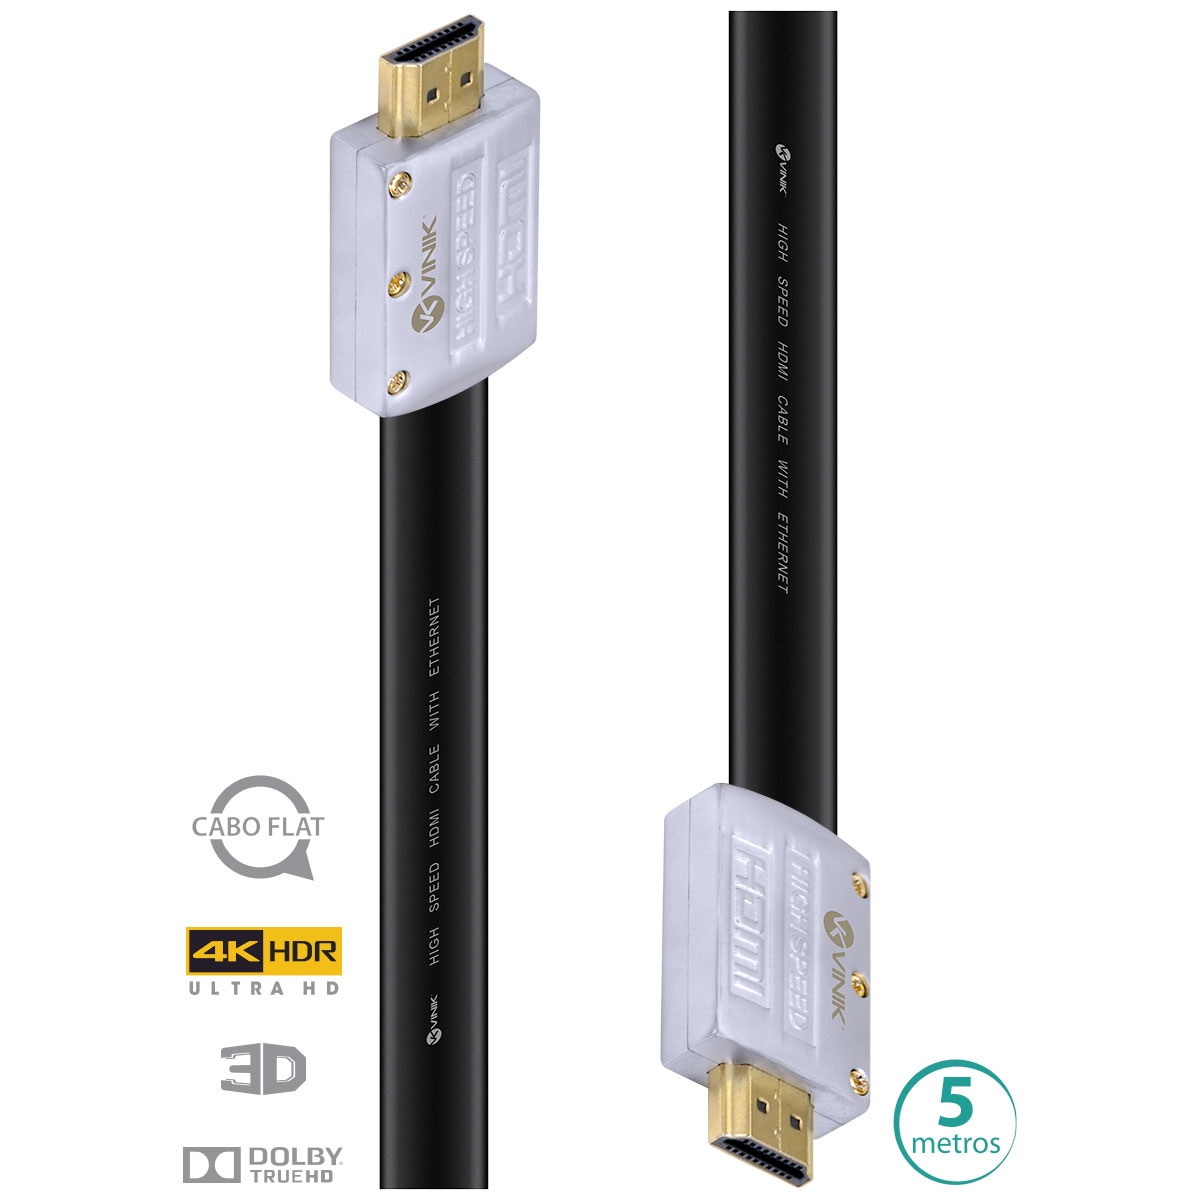 CABO HDMI 2.0 4K ULTRA HD 3D CONEXÃO ETHERNET FLAT COM CONECTOR DESMONTÁVEL 5 METROS - H20FL-5  - Audio Video & cia